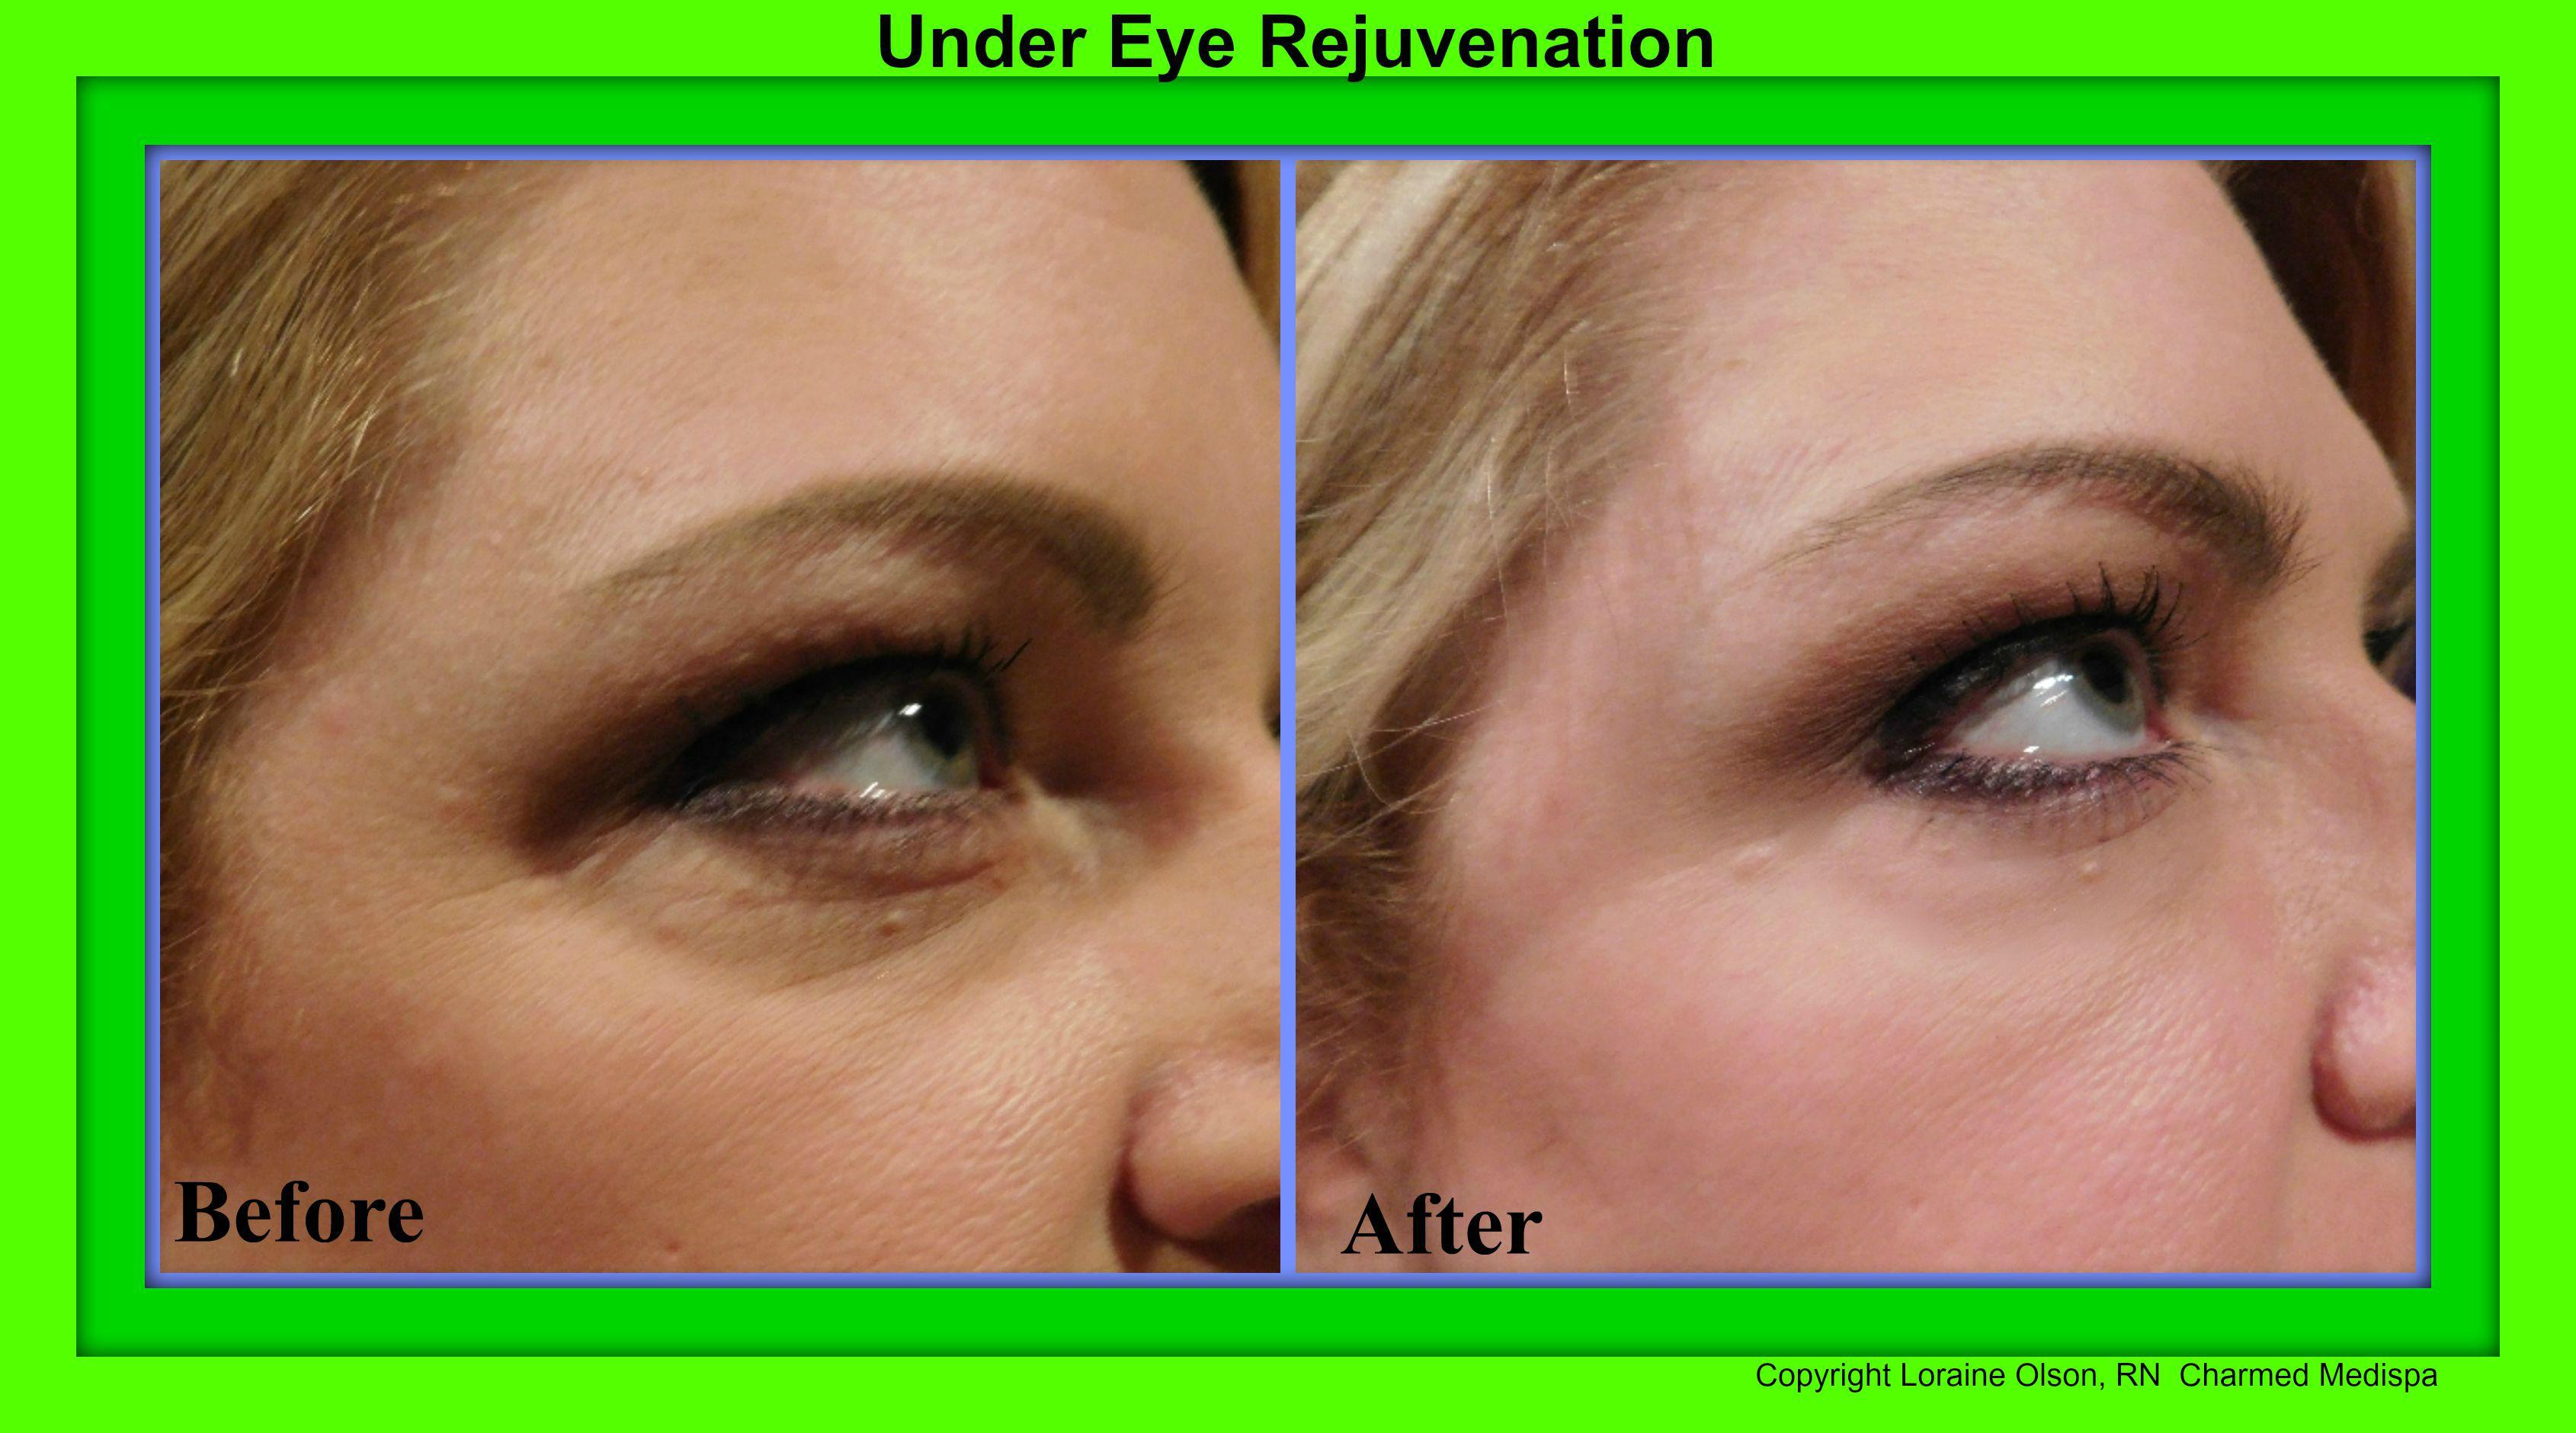 under eye rejuvenation surgery without nov